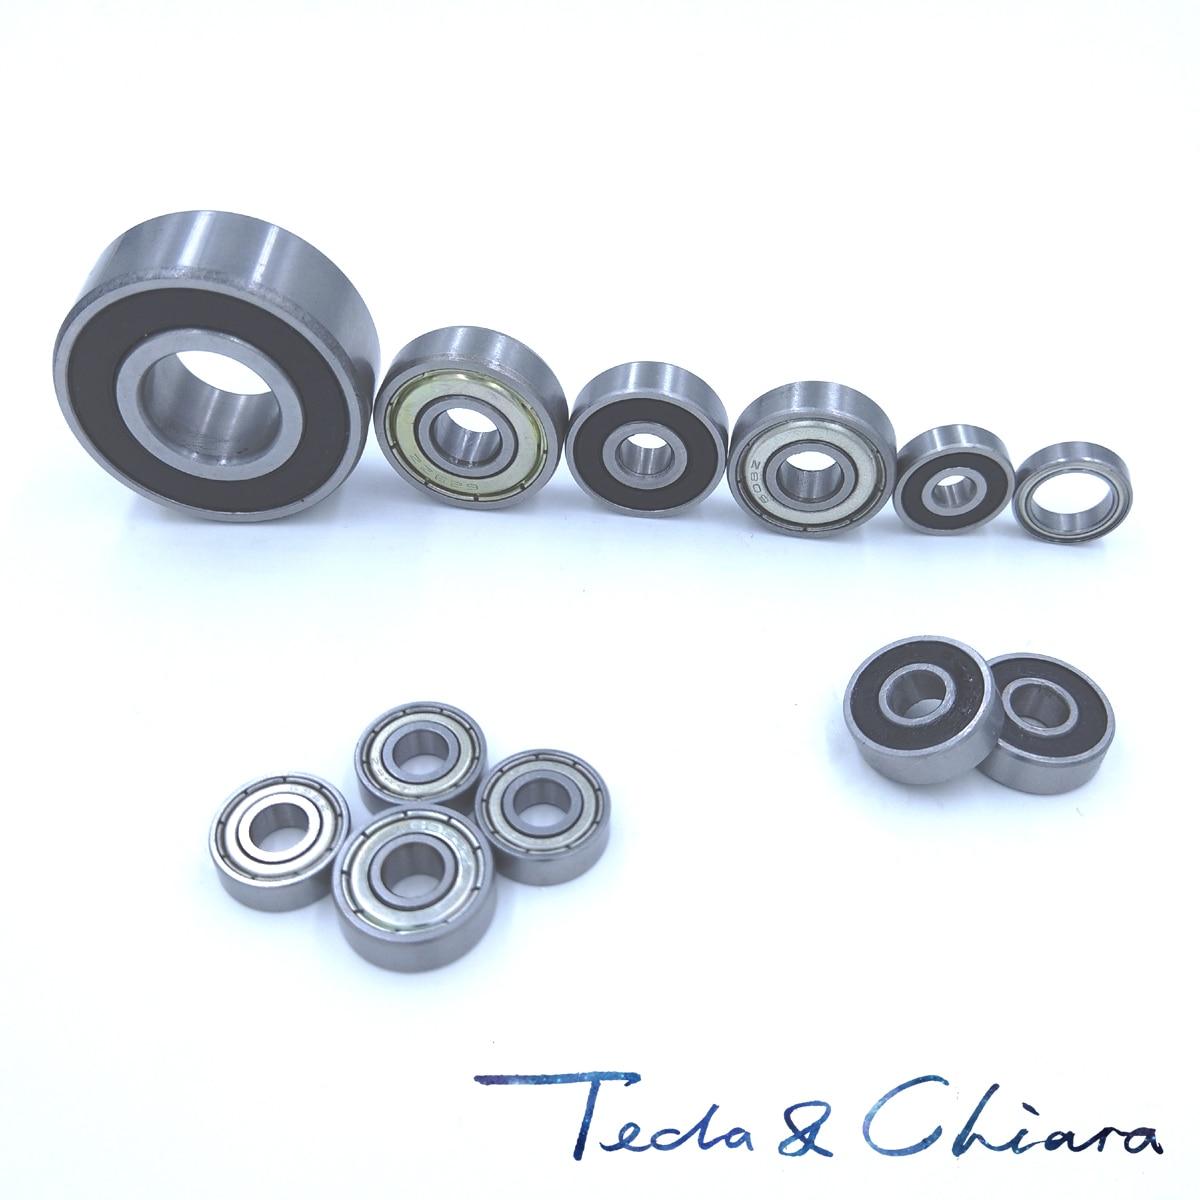 6002 6002ZZ 6002RS 6002-2Z 6002Z 6002-2RS ZZ RS RZ 2RZ Deep Groove Ball Bearings 15 X 32 X 9mm